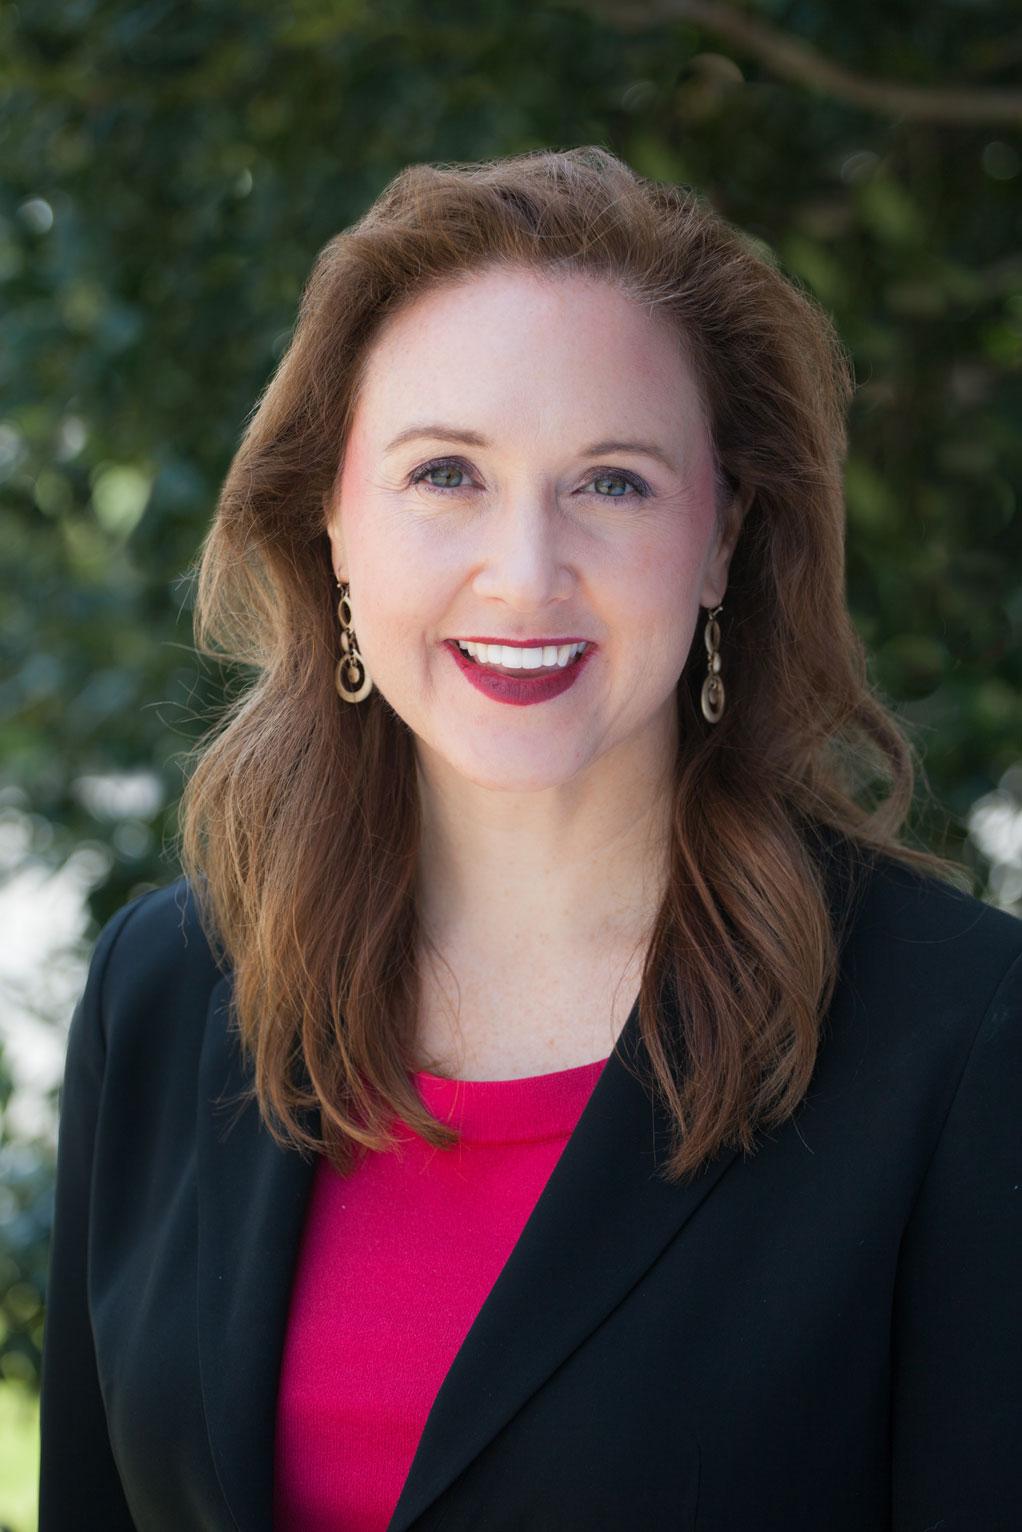 Photo of Jessica Kopperud, Business Development Specialist